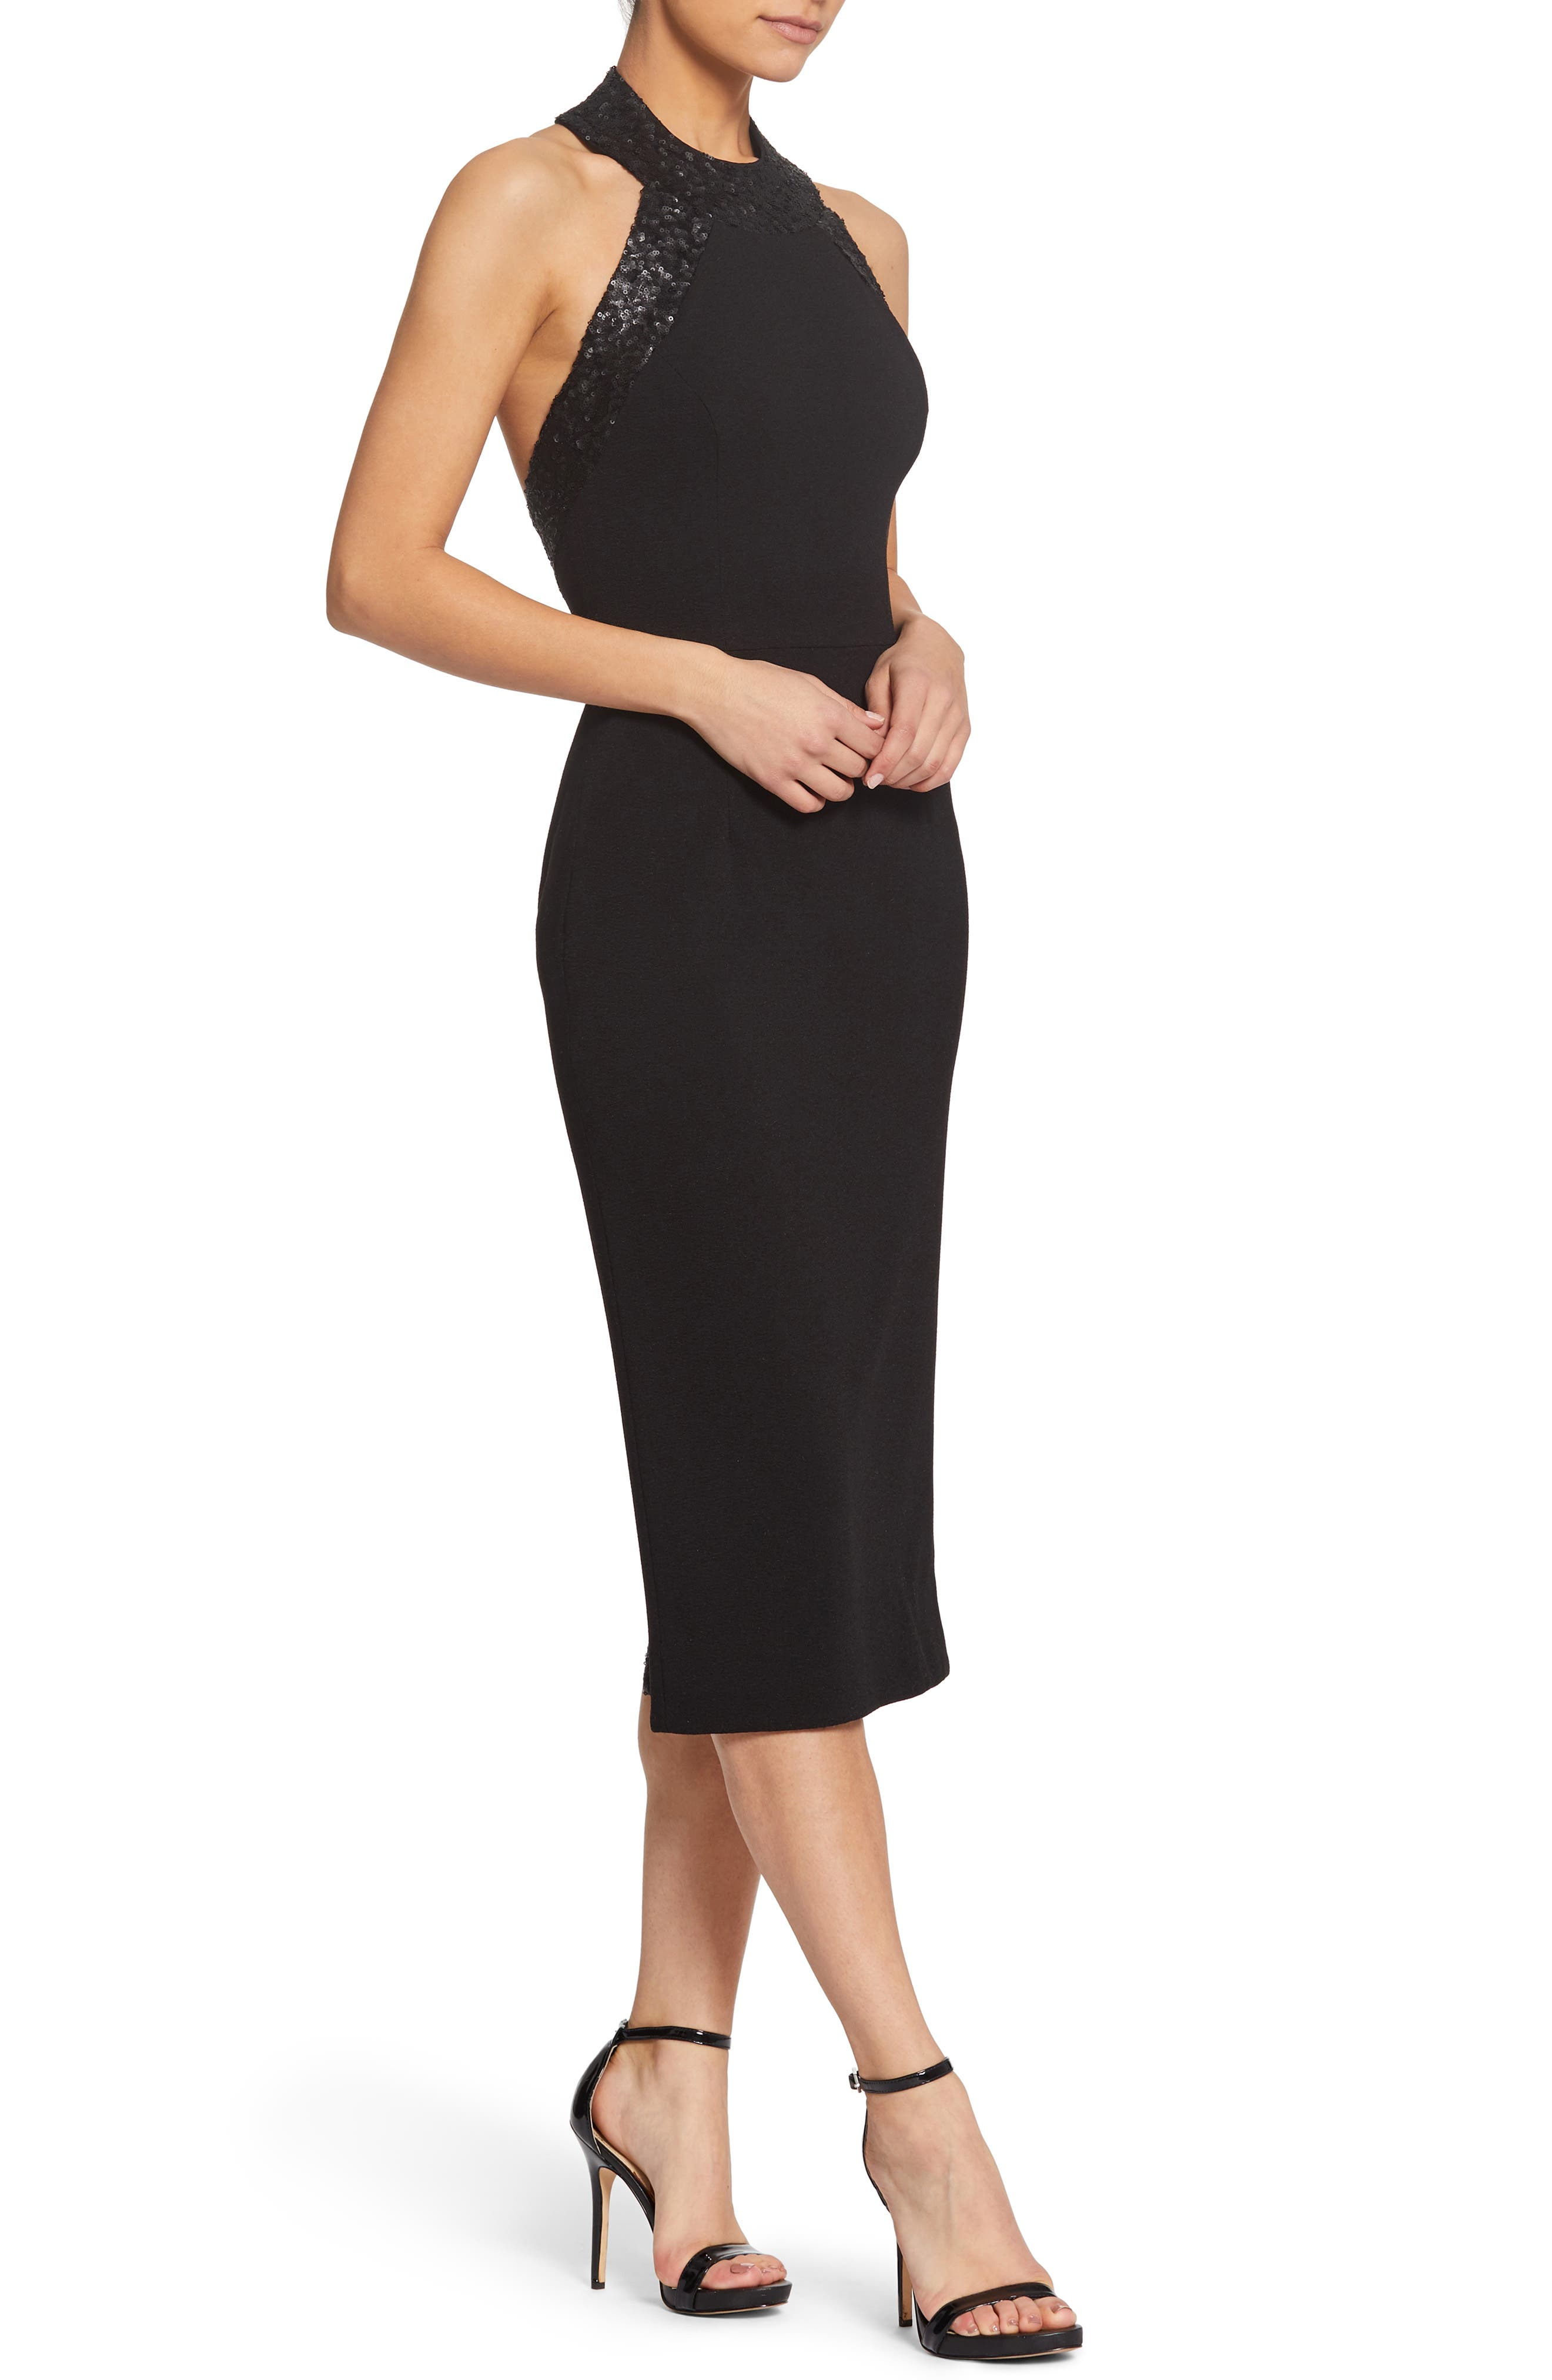 Cleo Halter Dress,                             Alternate thumbnail 4, color,                             BLACK/ BLACK